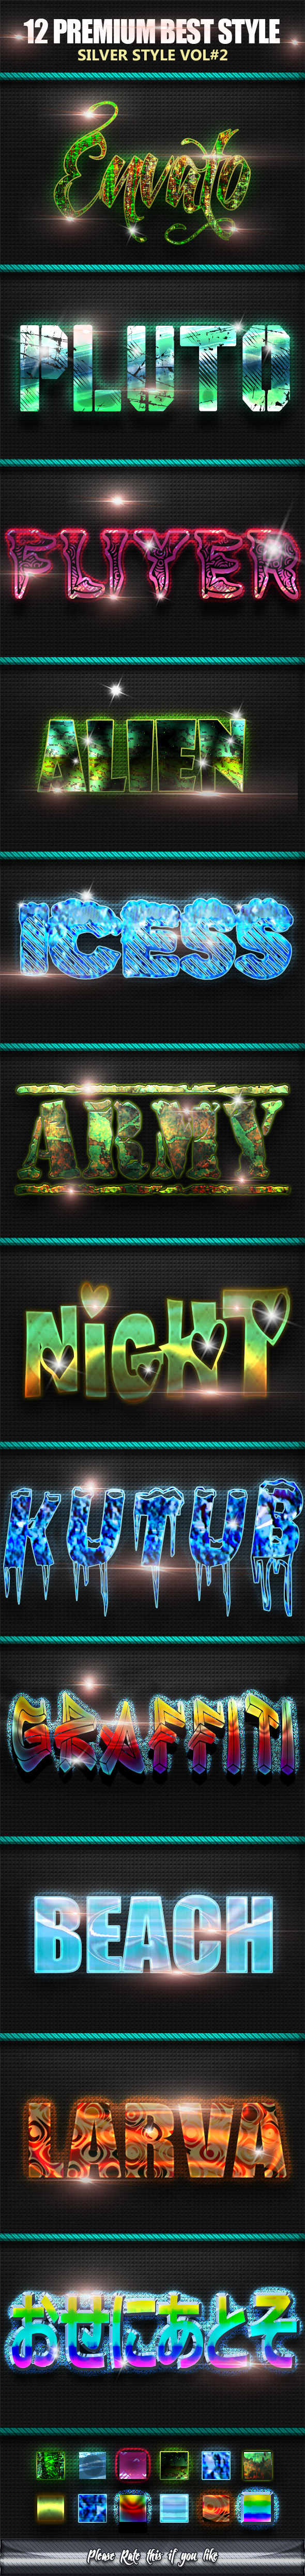 12 Premium Text Photoshop Styles vol 2 - Text Effects Styles